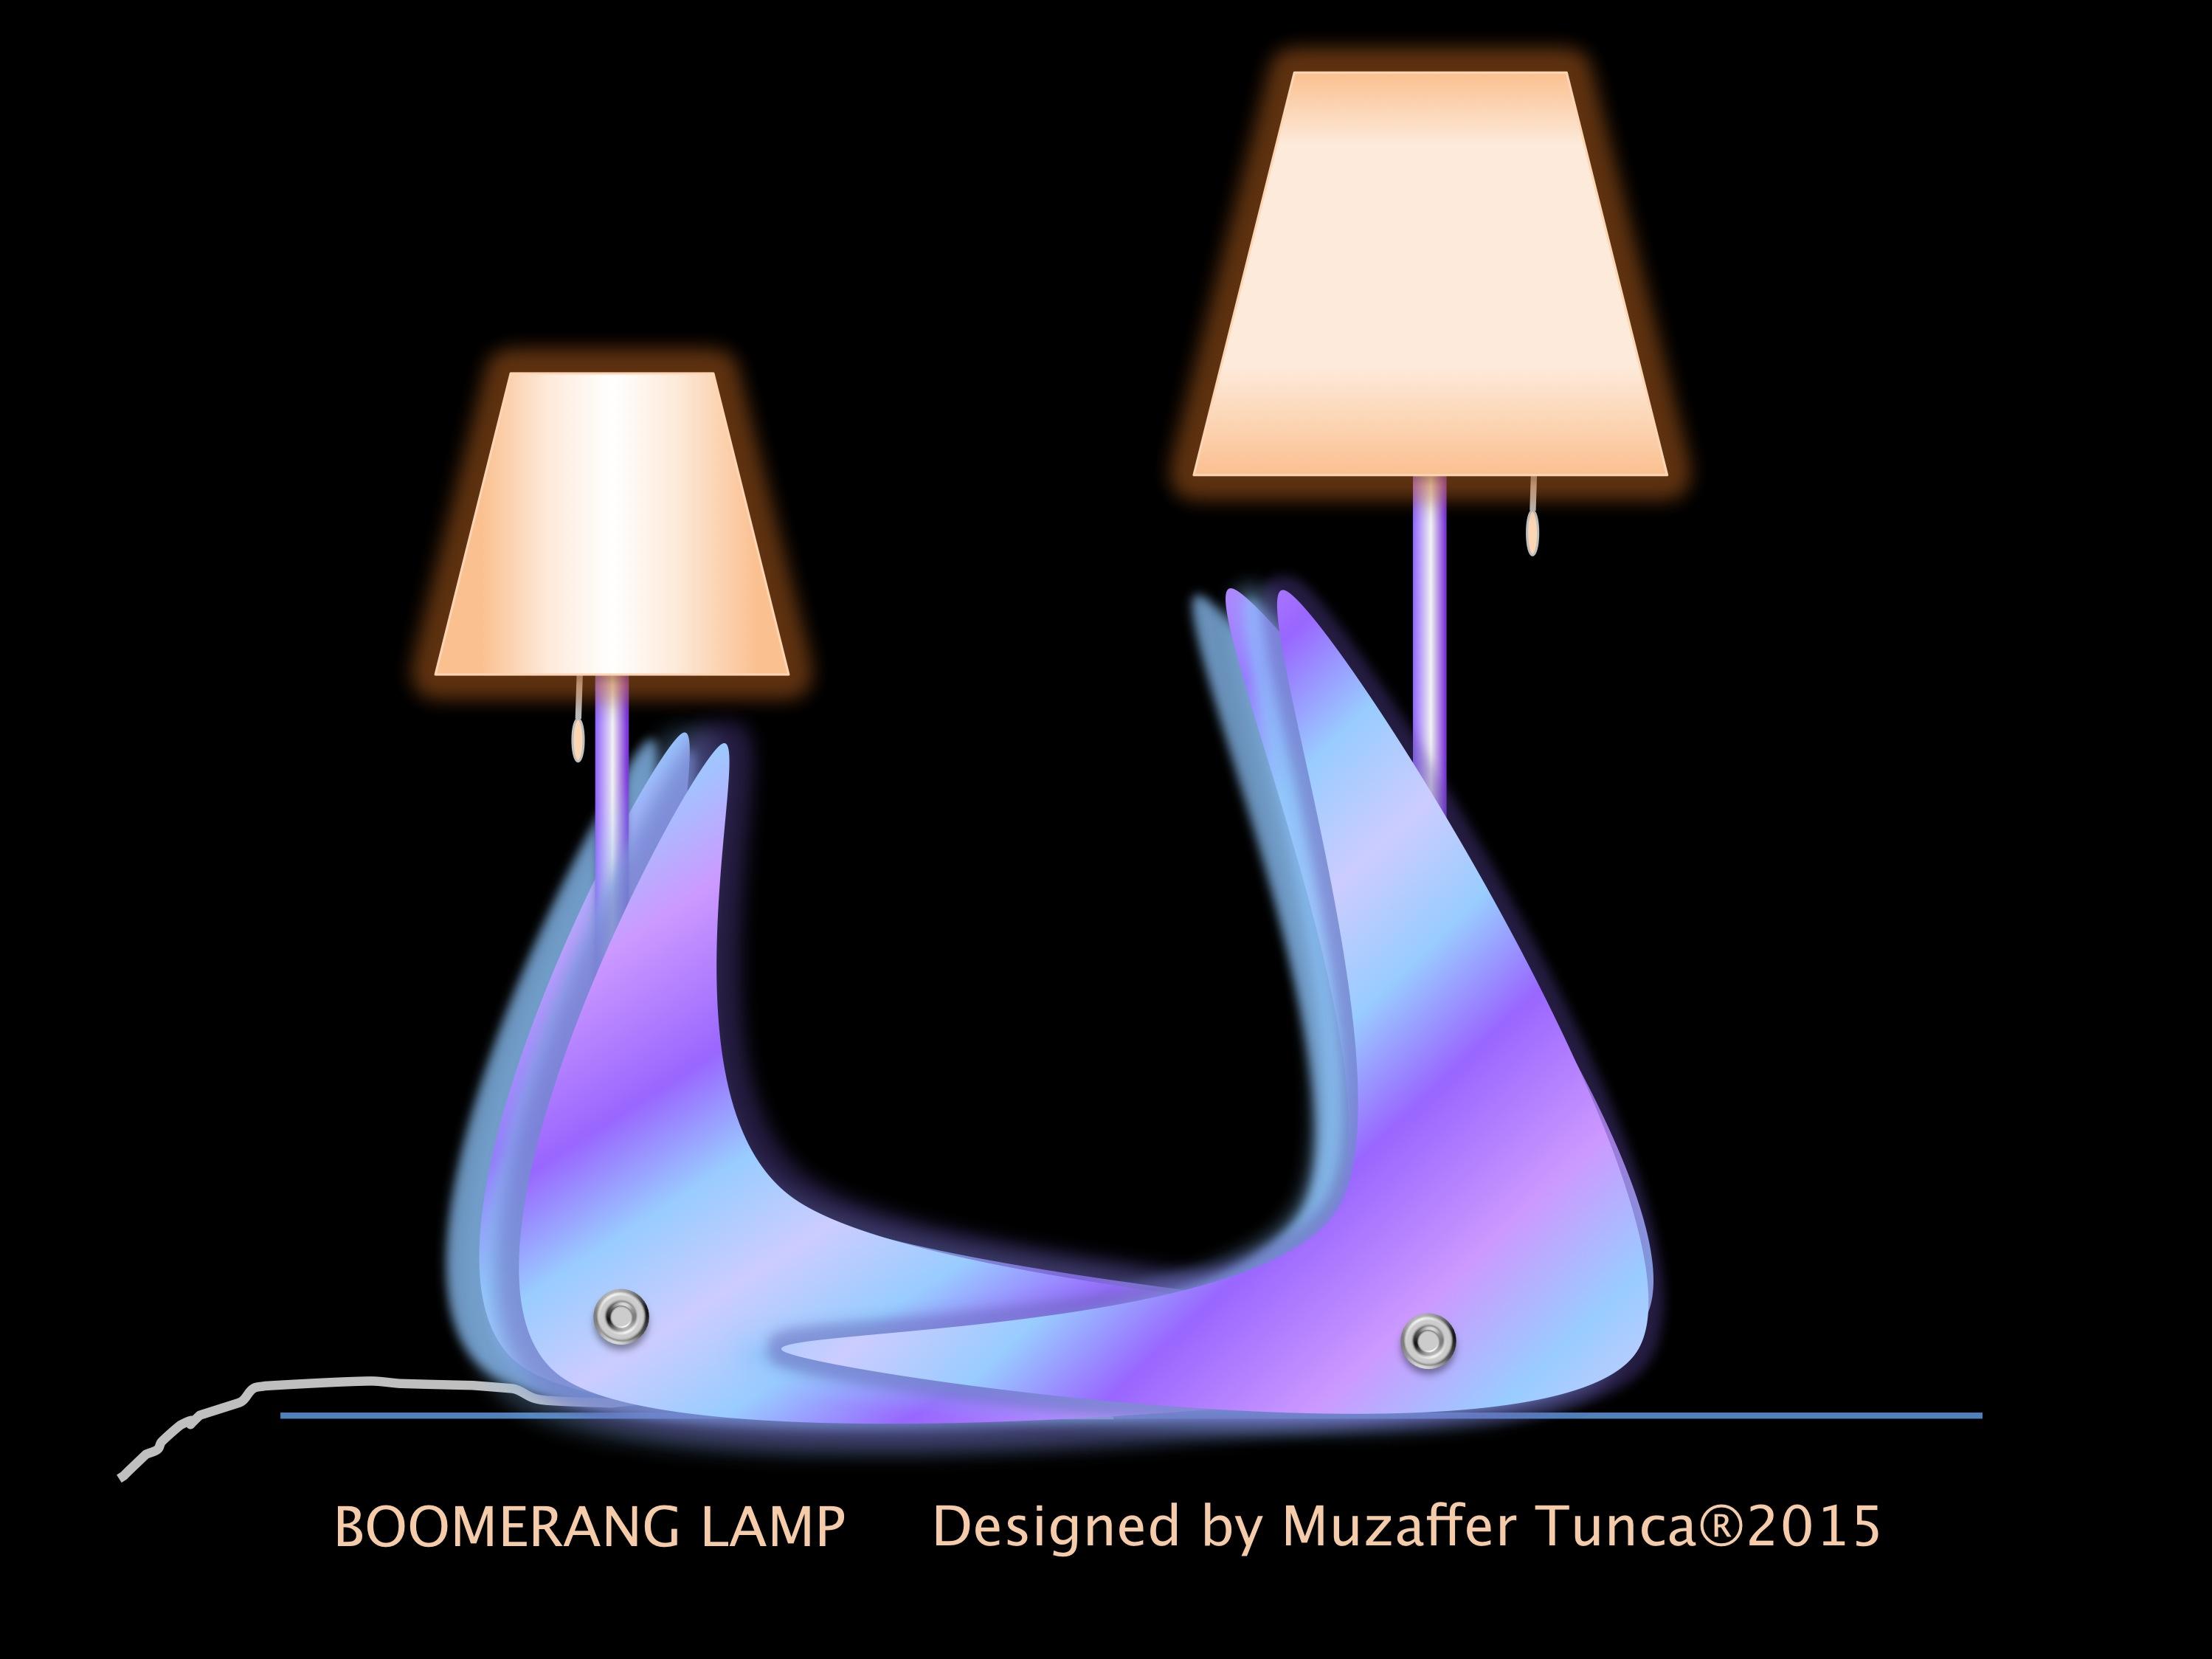 BOOMERANG LAMP